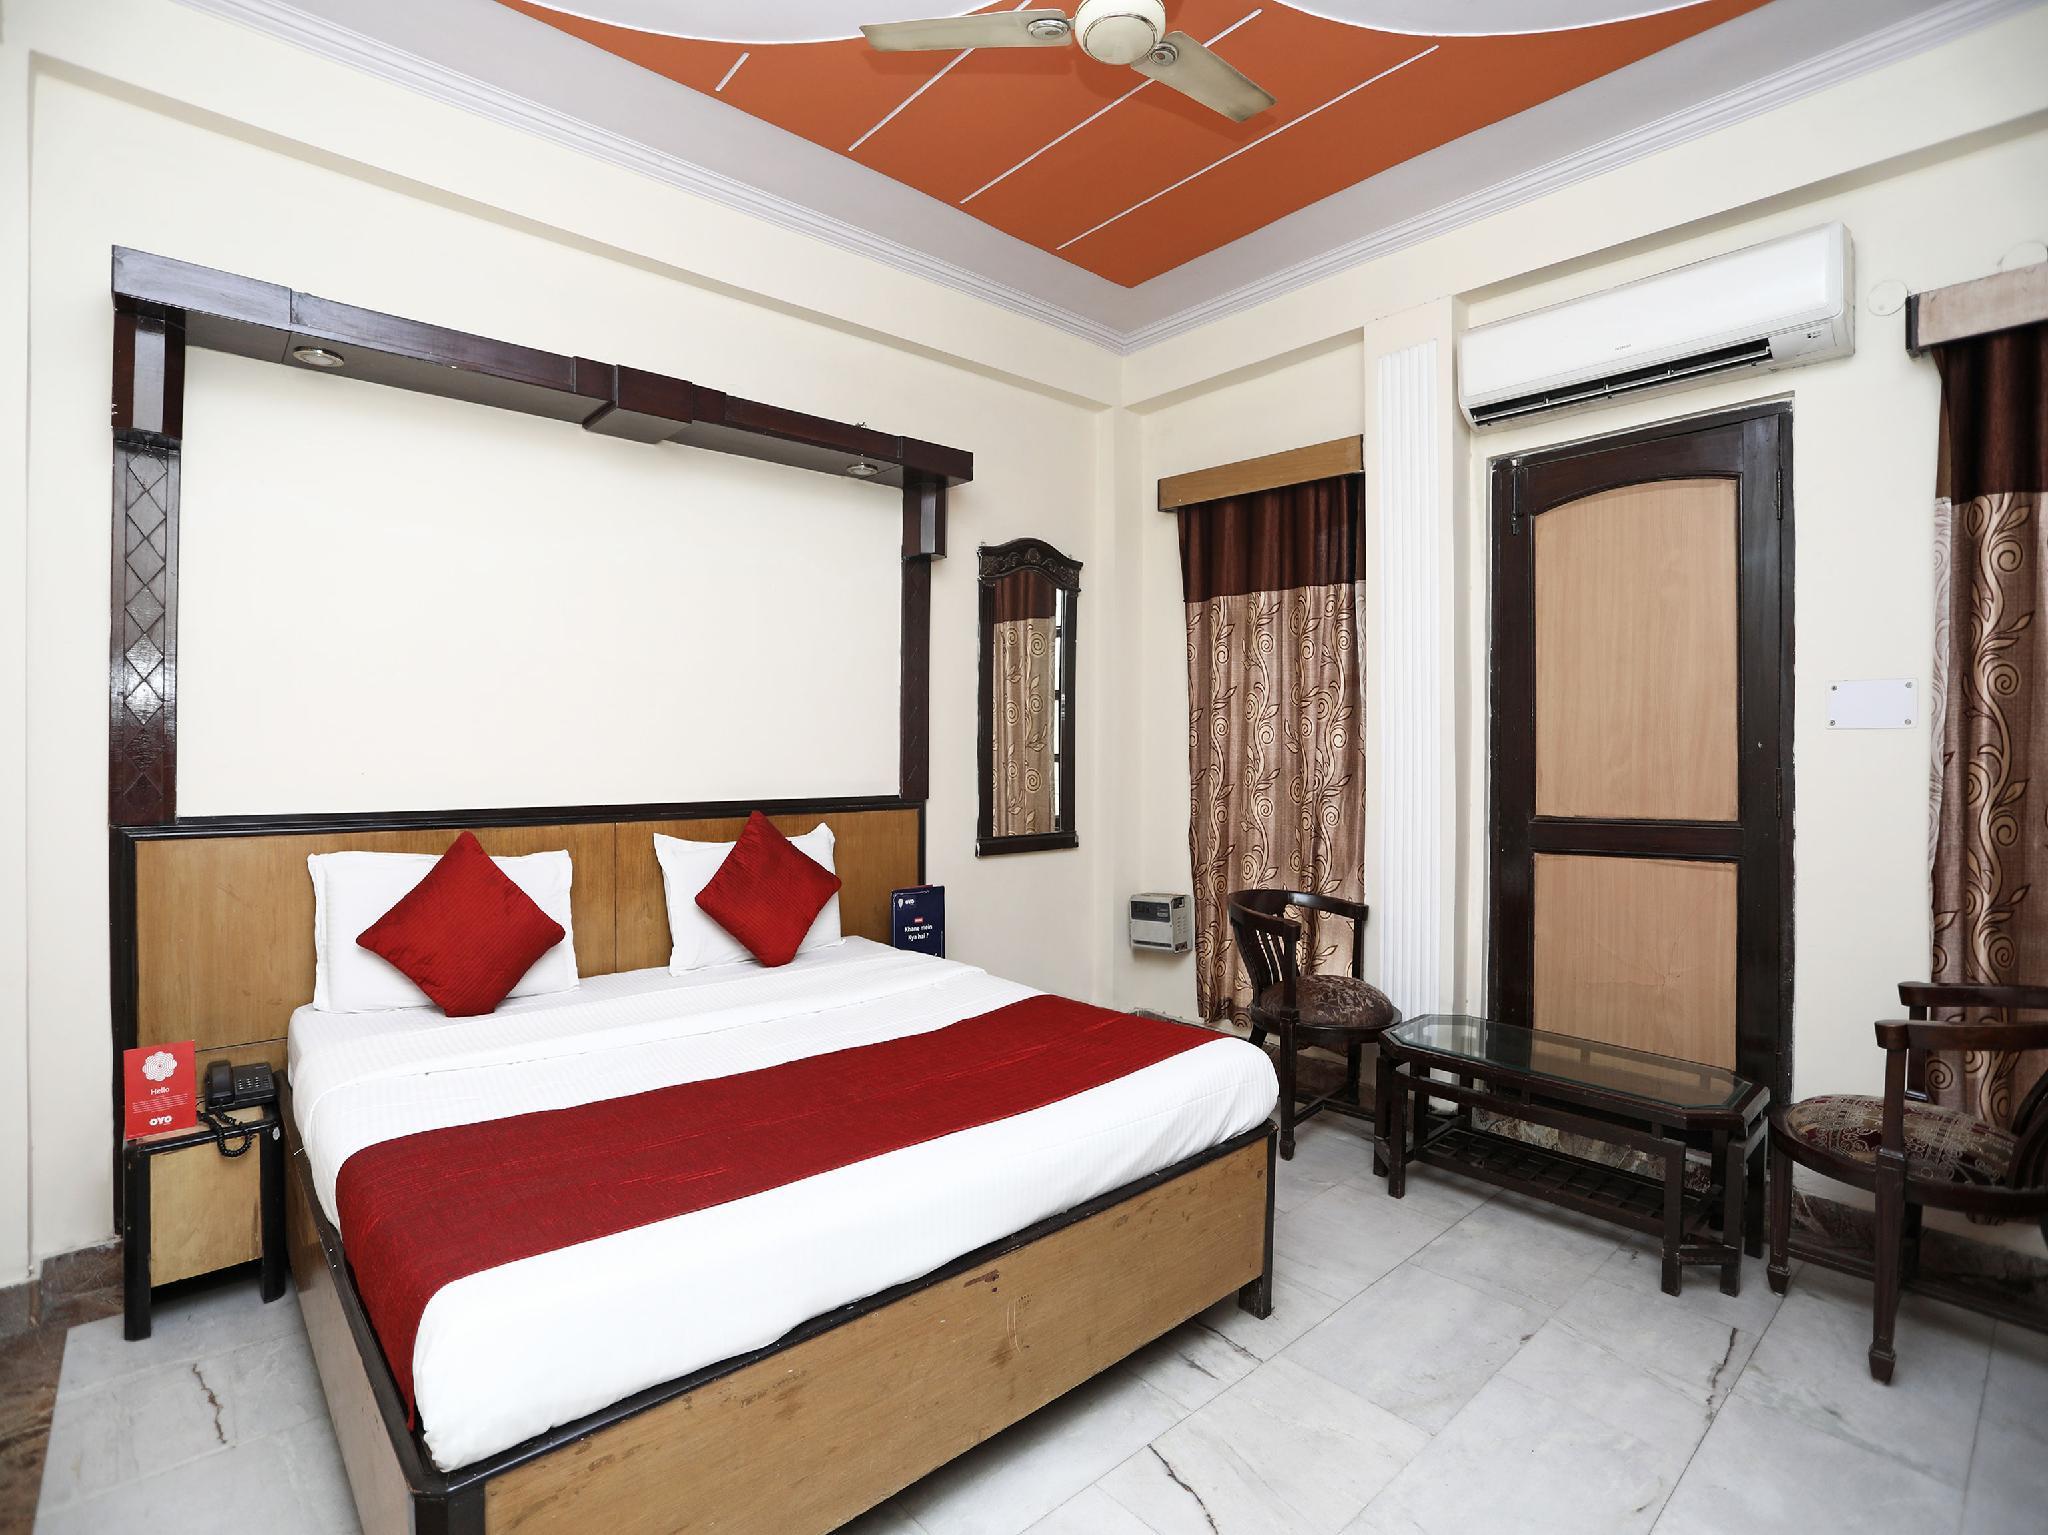 OYO 12671 Hotel Prithvi Palace